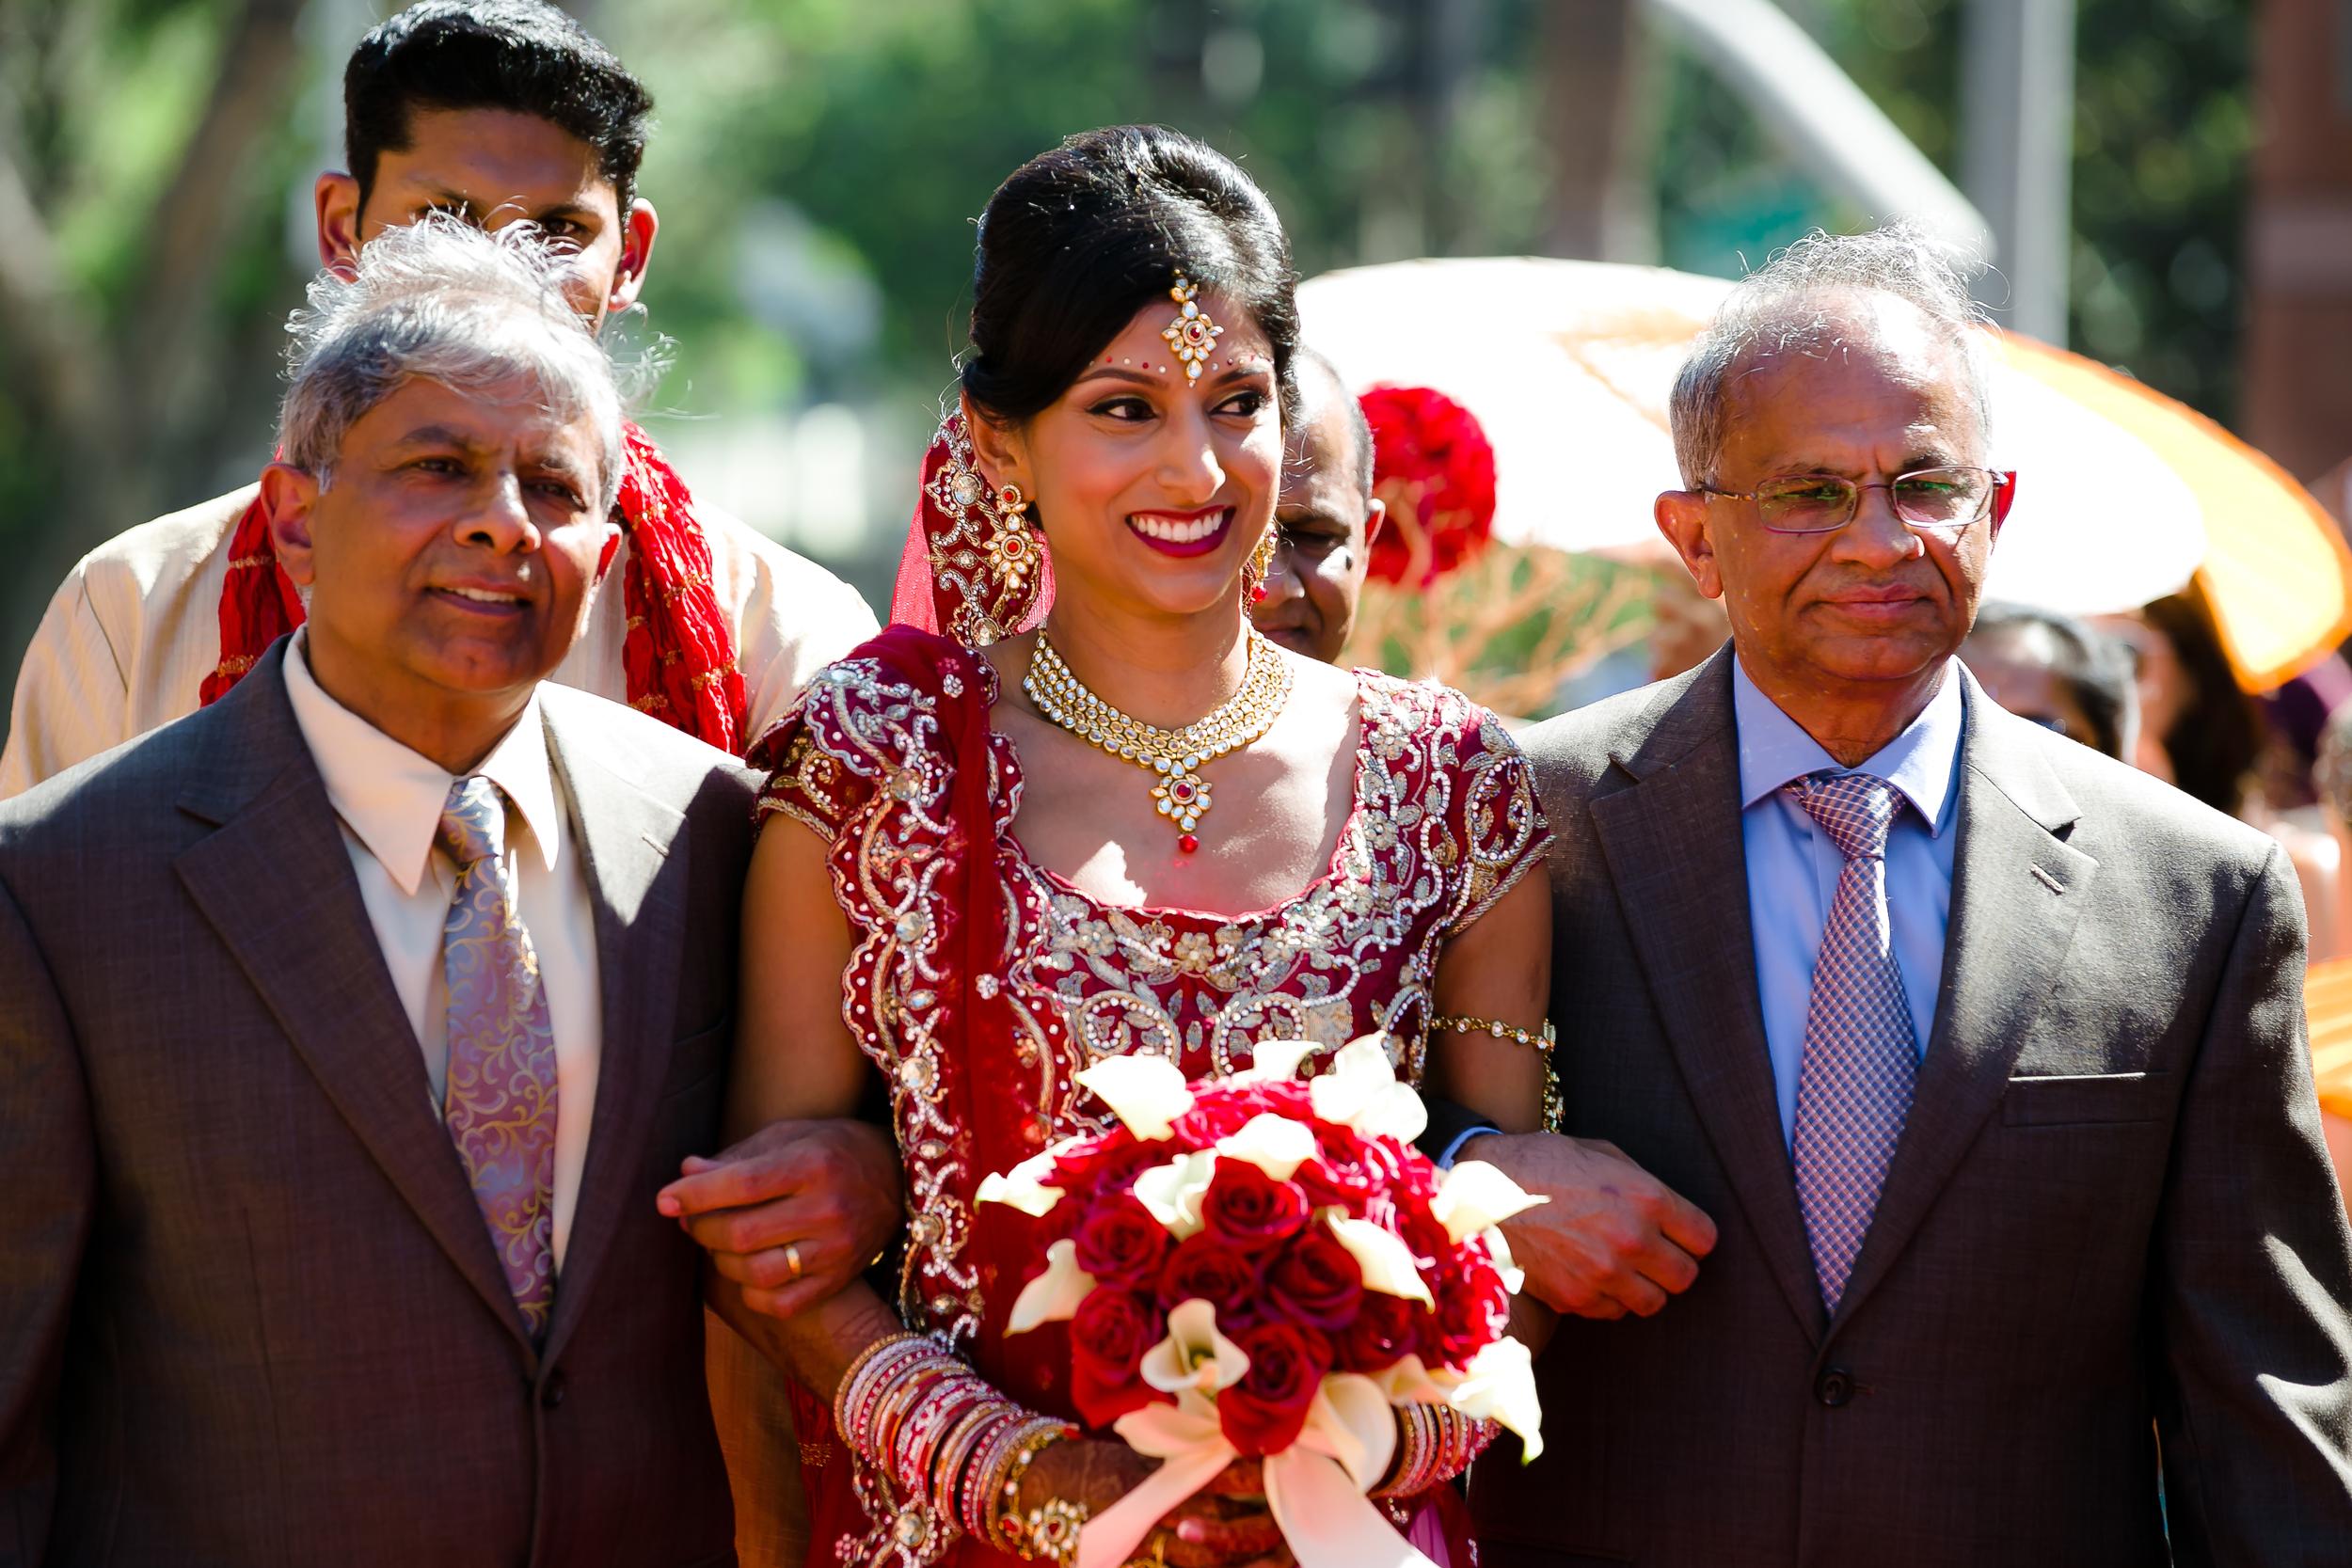 SOUTHEAST-ASIAN-INDIAN-WEDDING_038.jpg